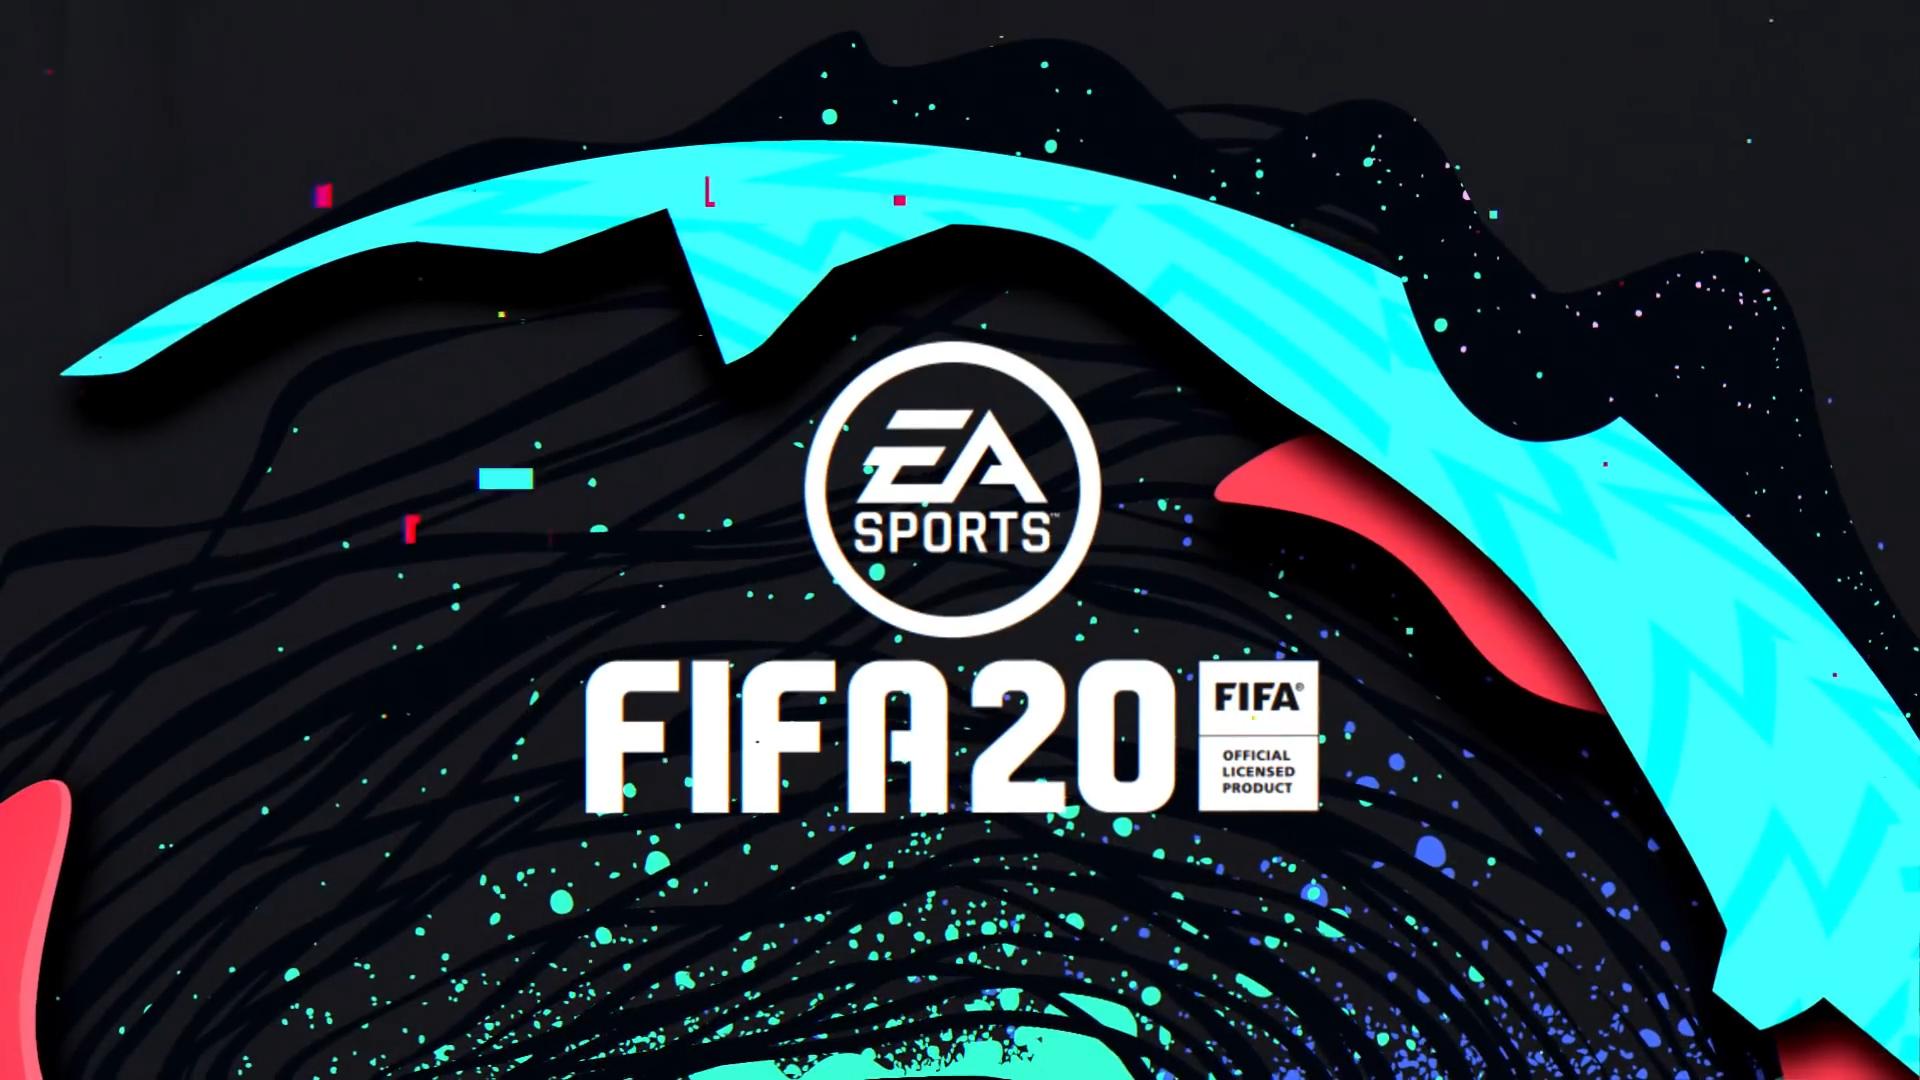 FIFA 2020: Μάθε μπαλίτσα αγόρι μου - Sportime.GR